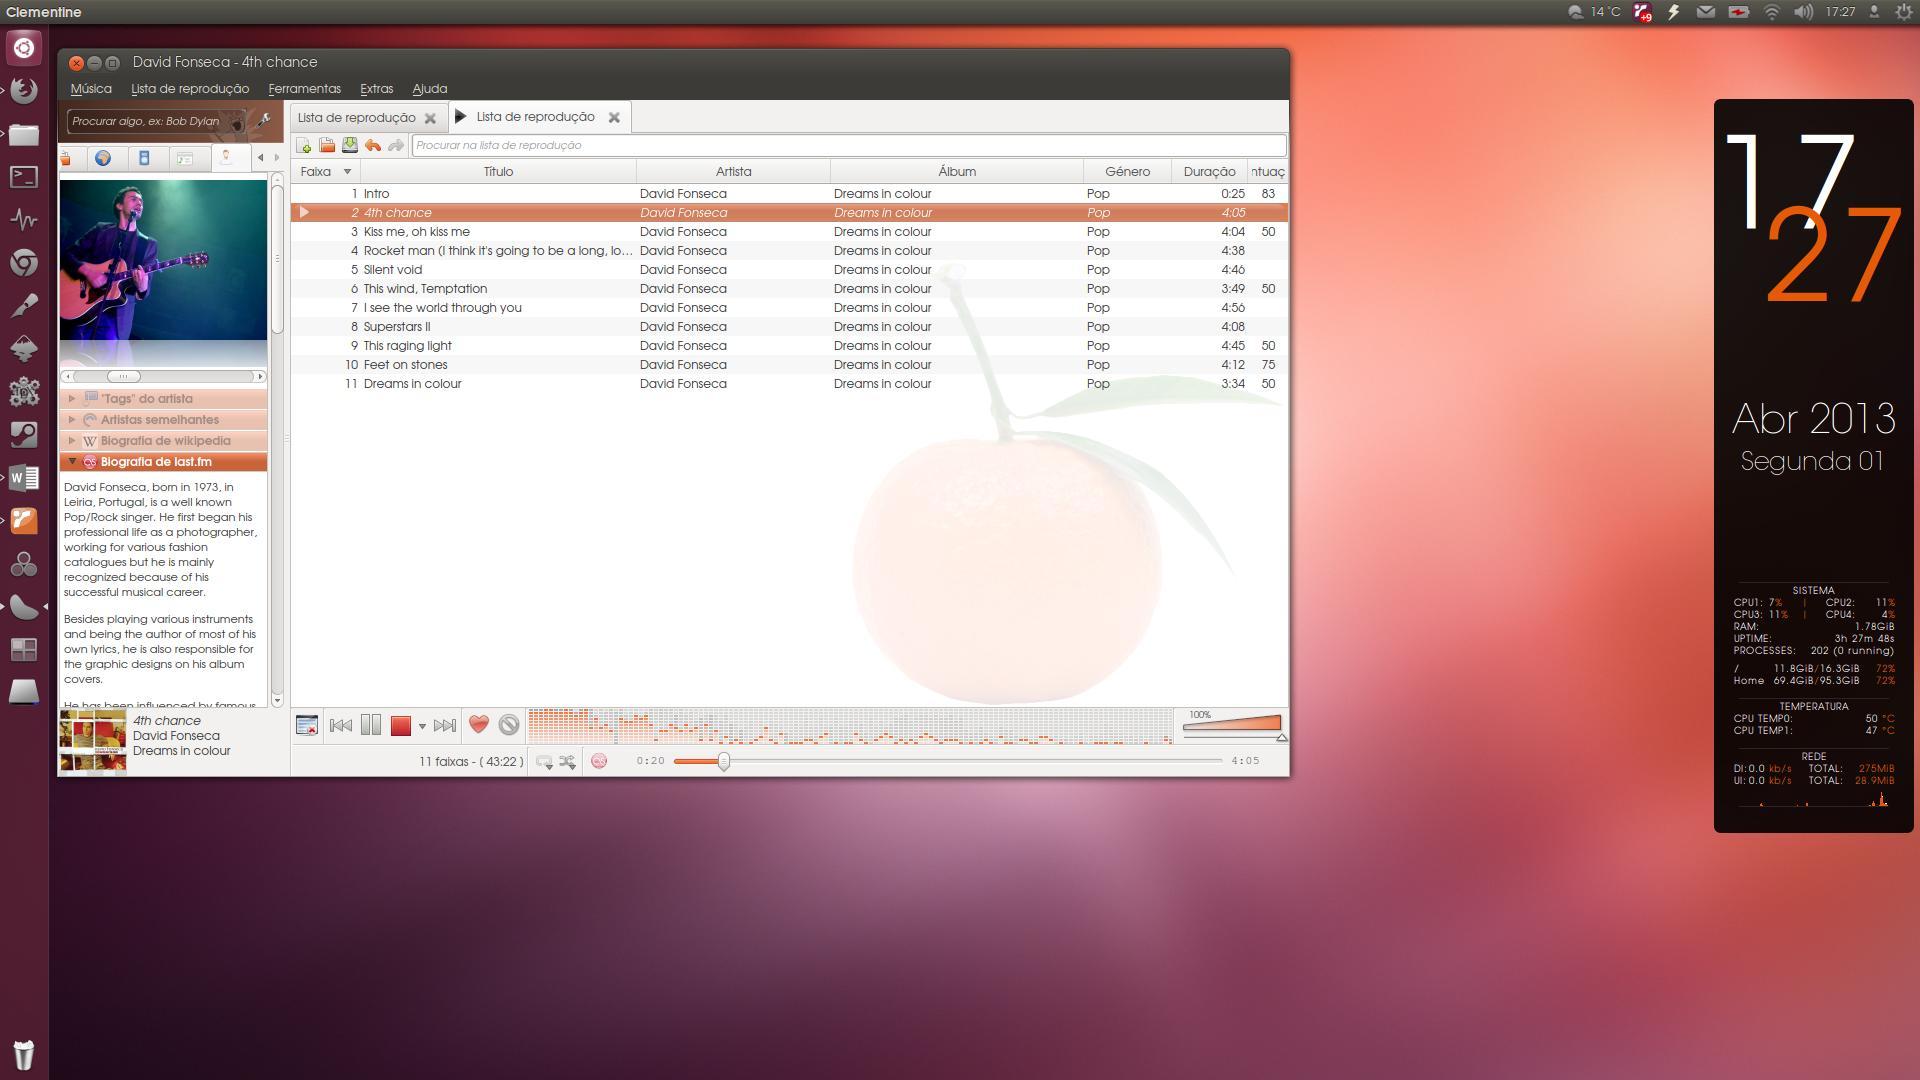 Qbittorrent Ubuntu 13.04 Free Download